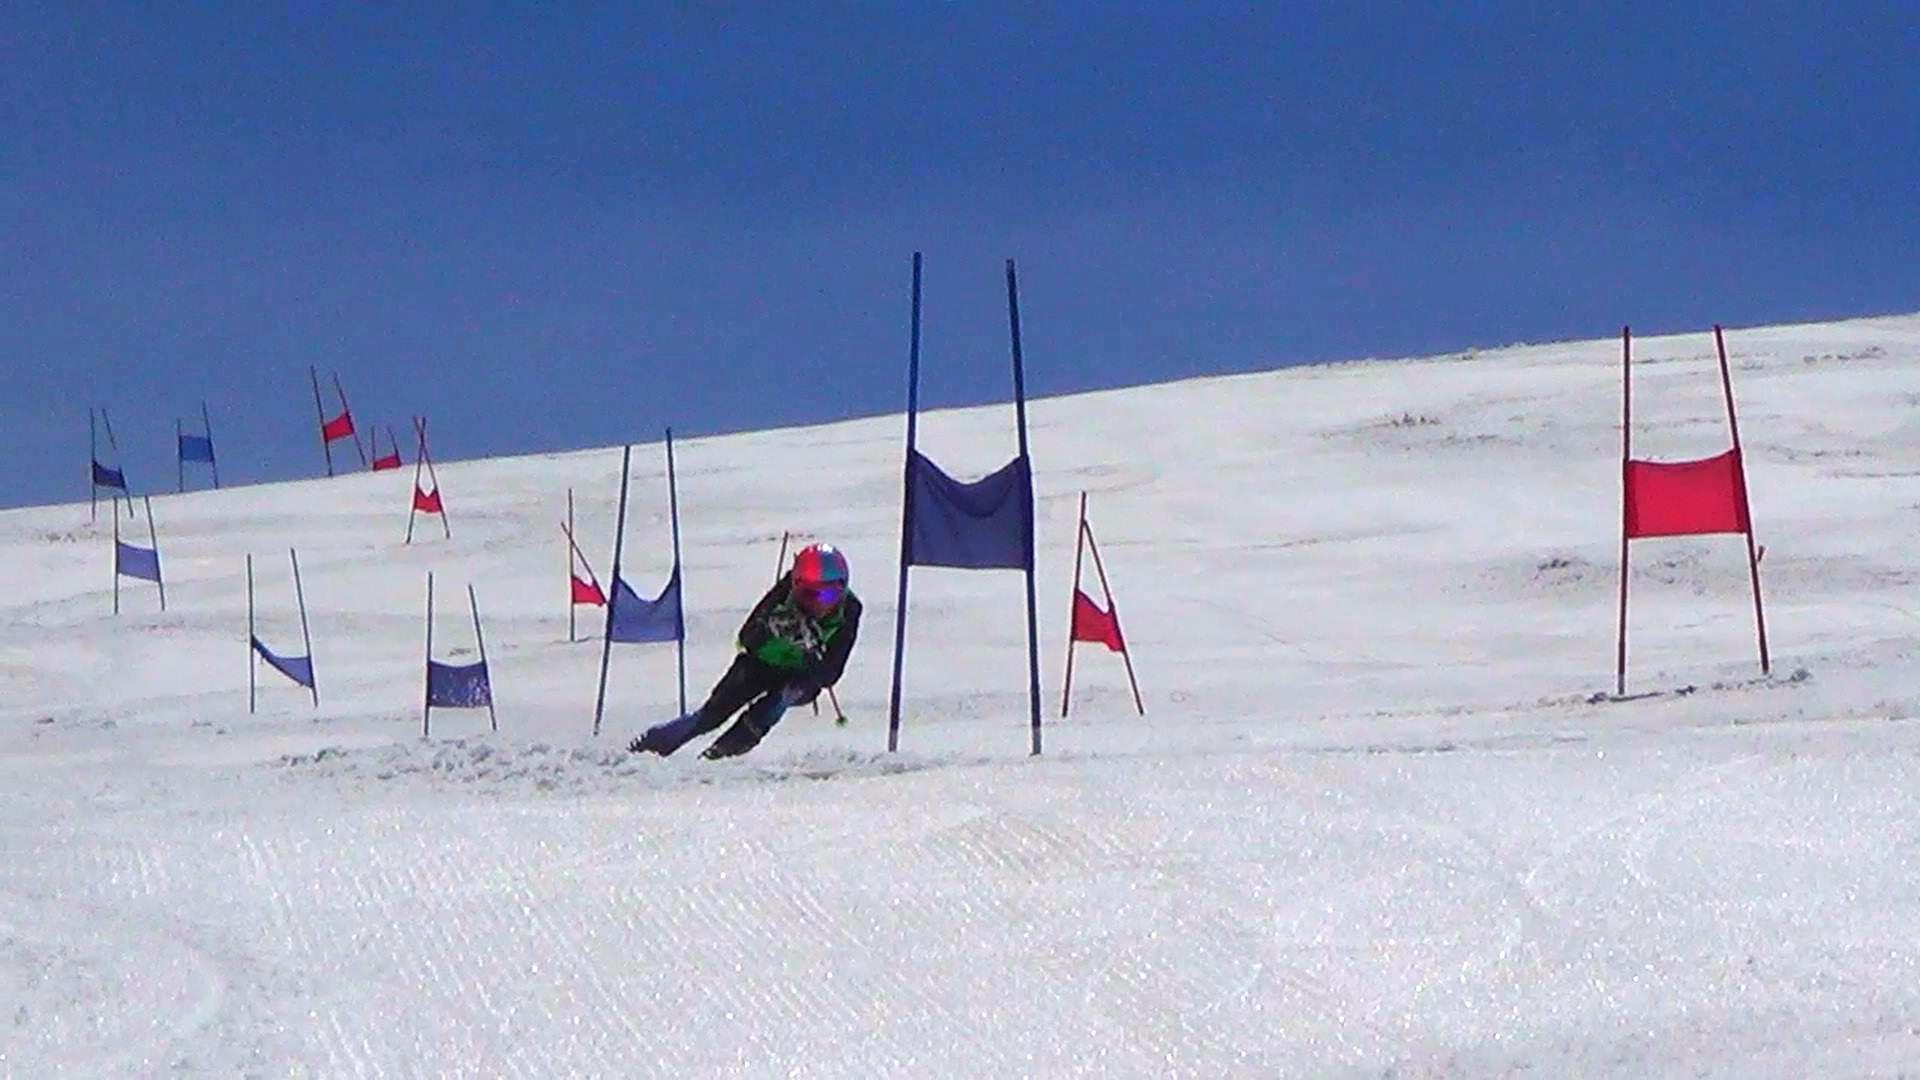 Giant Slalom Les 2 Alpes